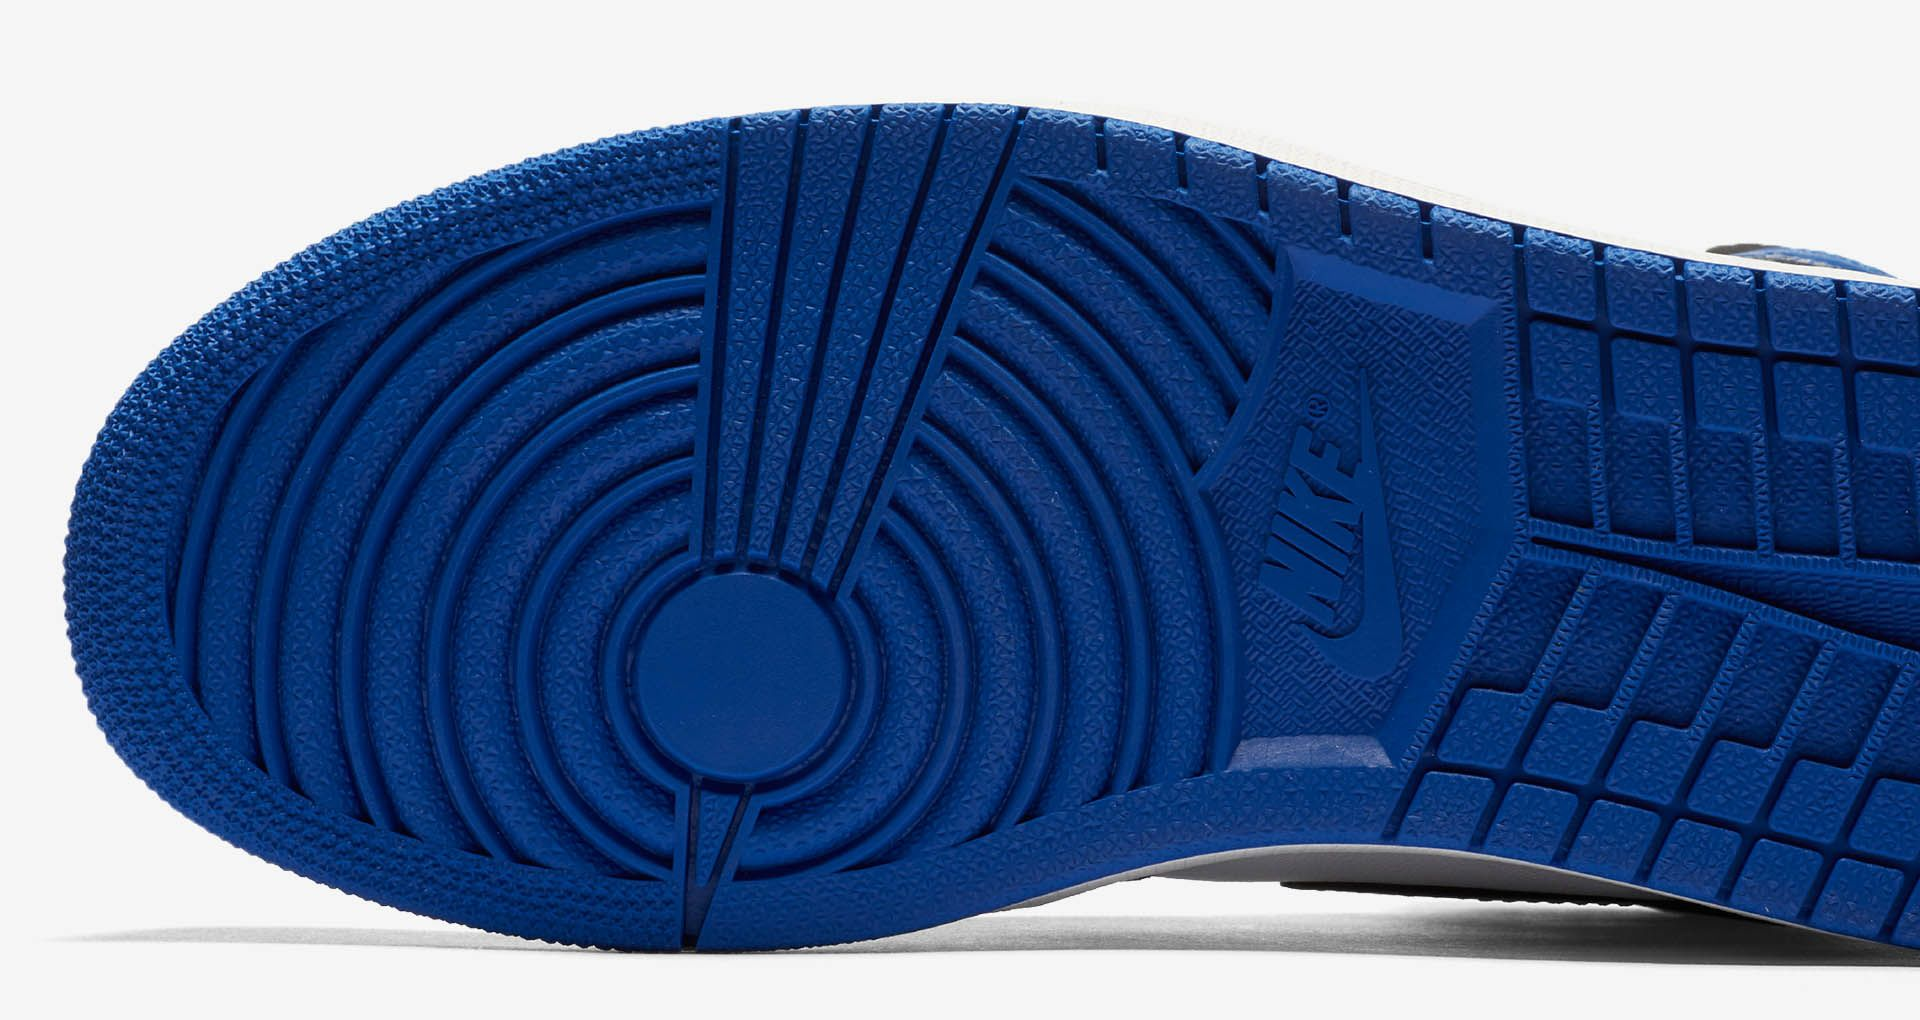 dc57d0e2caf Air Jordan 1  Game Royal   Black   Summit White  Release Date. Nike ...